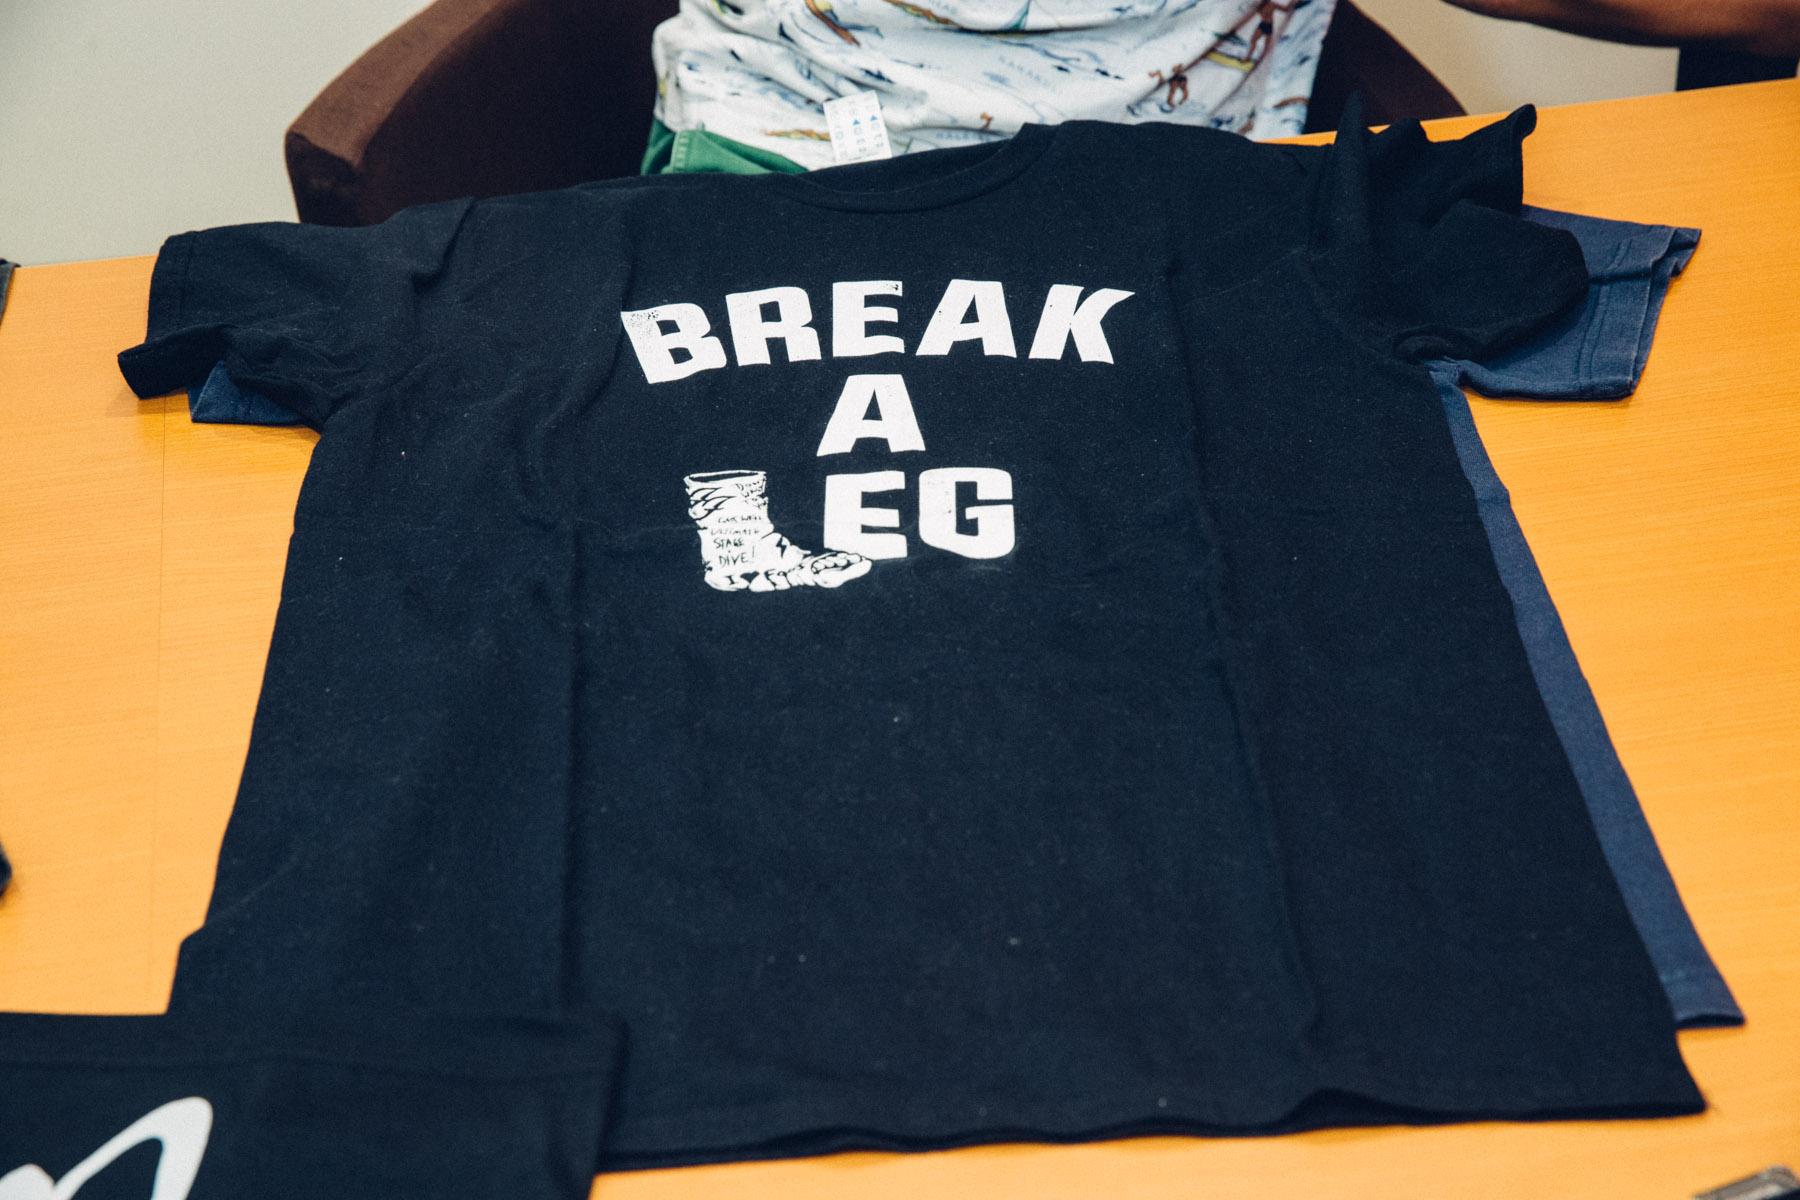 8_MG_2599 音楽好き芸人ハライチ、今年はふたりでフジロックへ行こう!?お気に入りのロックTシャツ対決も!